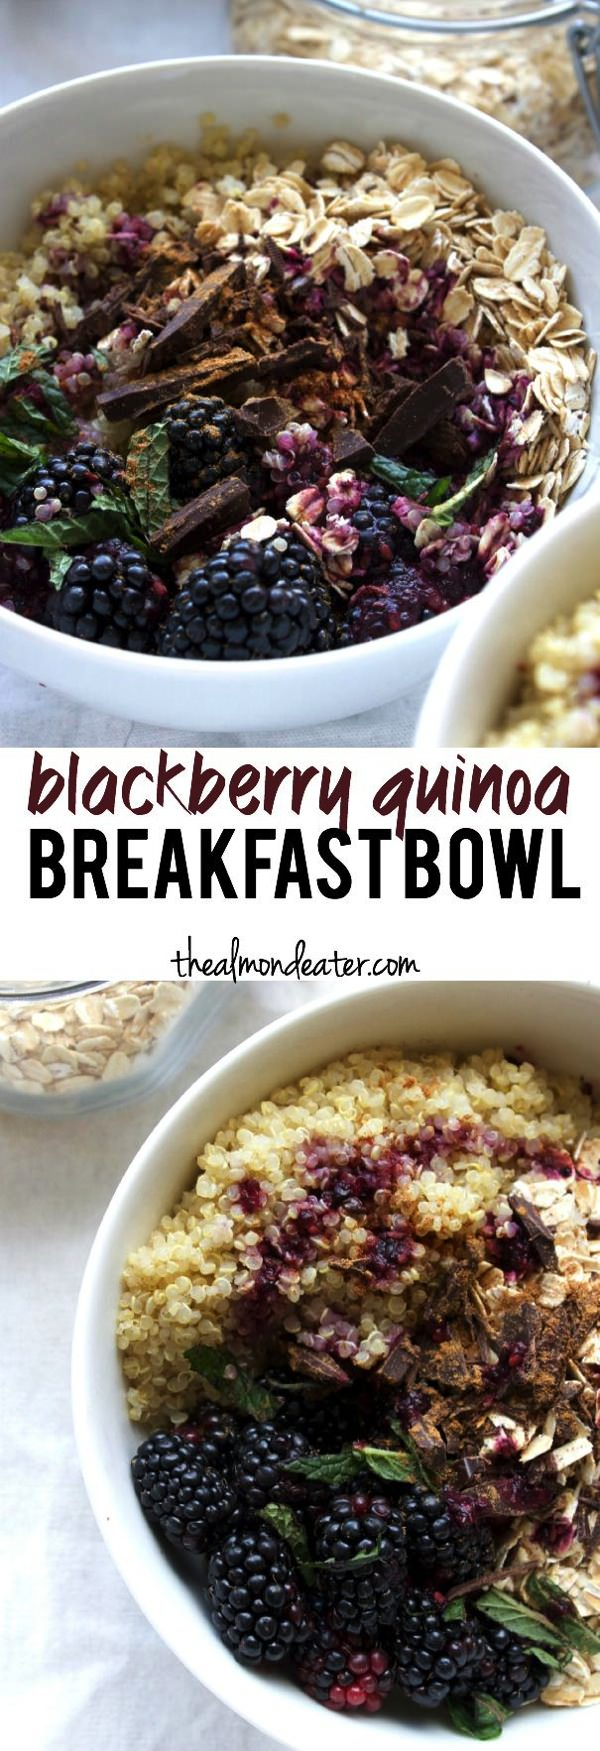 Blackberry Quinoa Breakfast Bowl